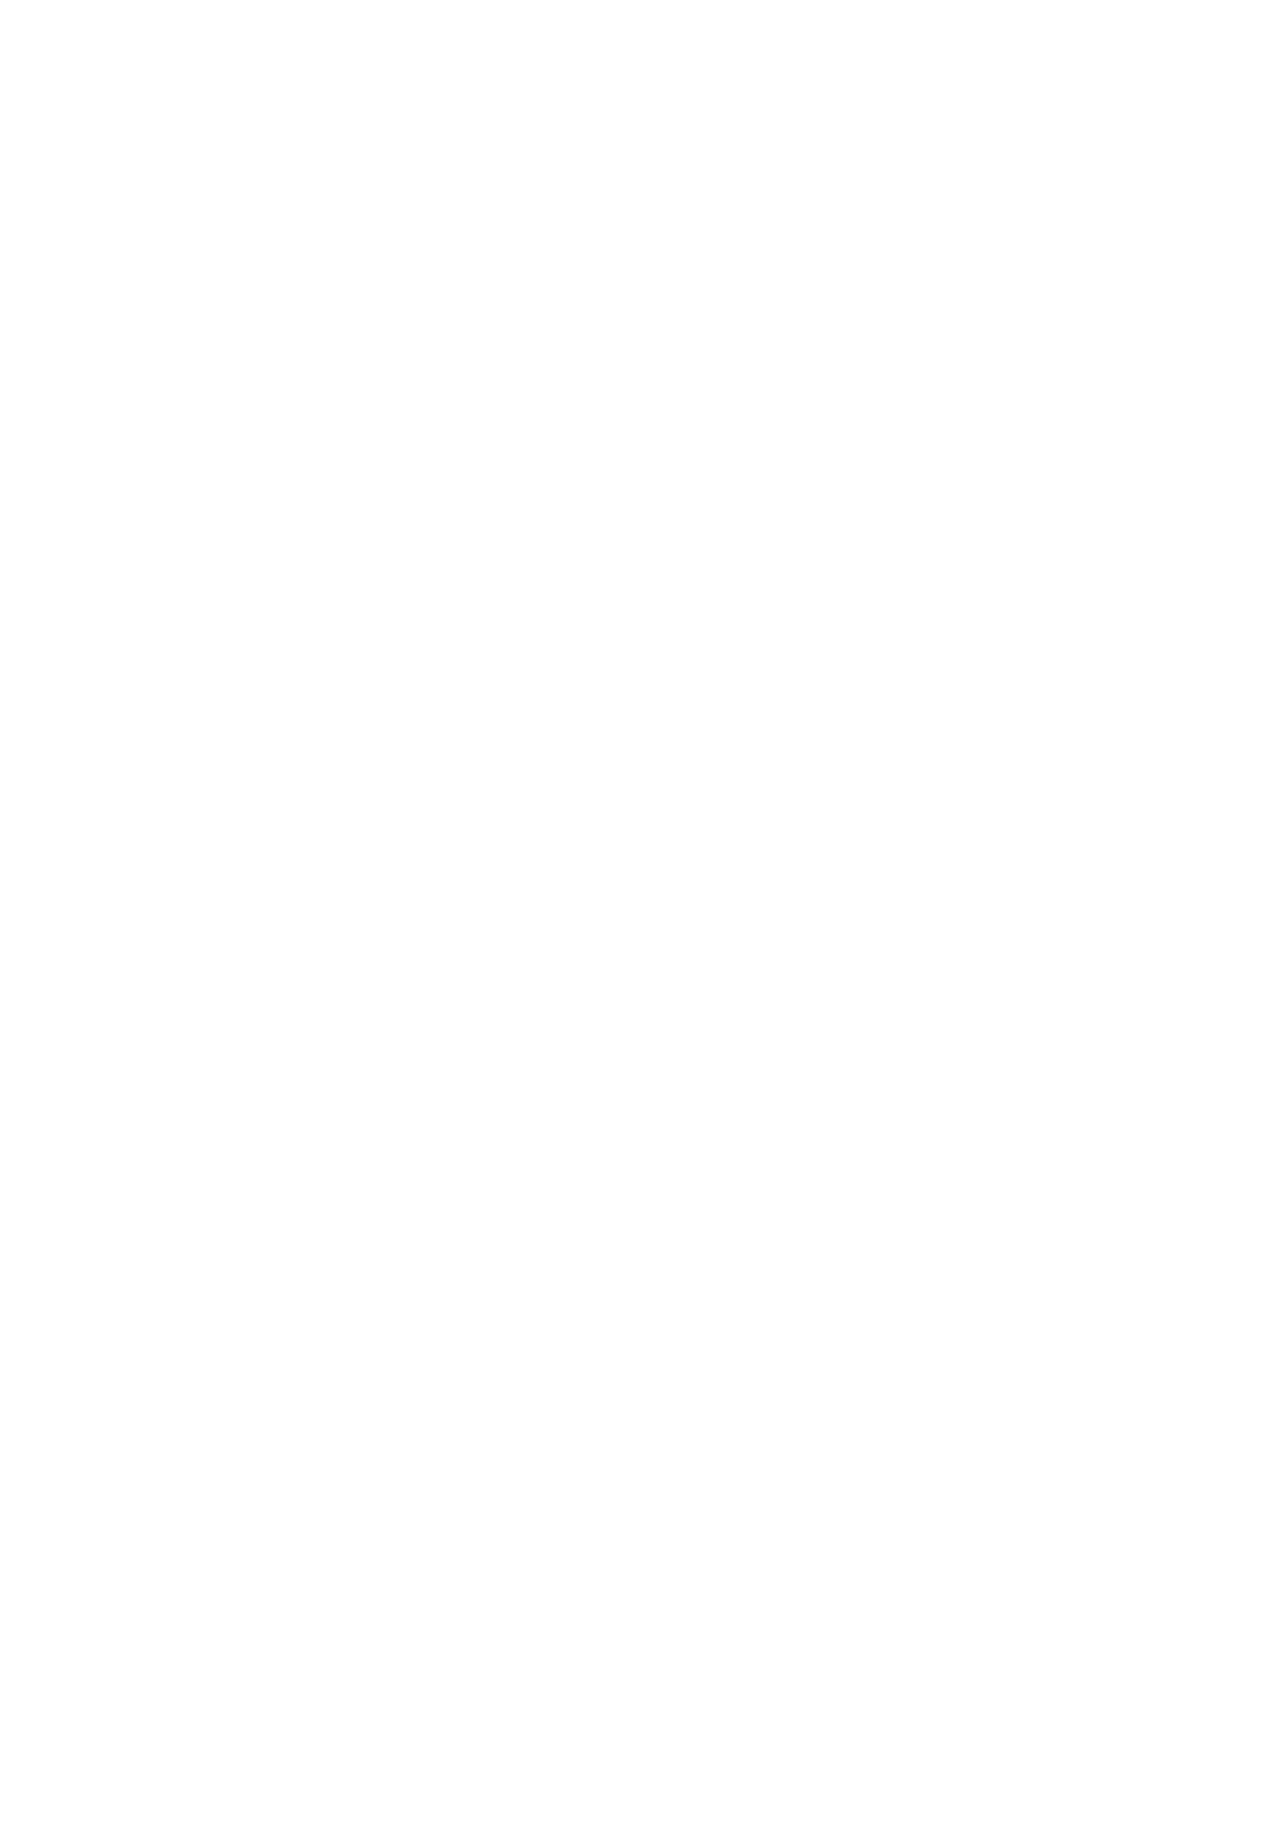 [Hanya Yashiki (Hanya)] Yobae Inko-chan S8   Nightcrawler Inko-chan S8 [English] {Mistvern + Bigk40k} [Digital] 1